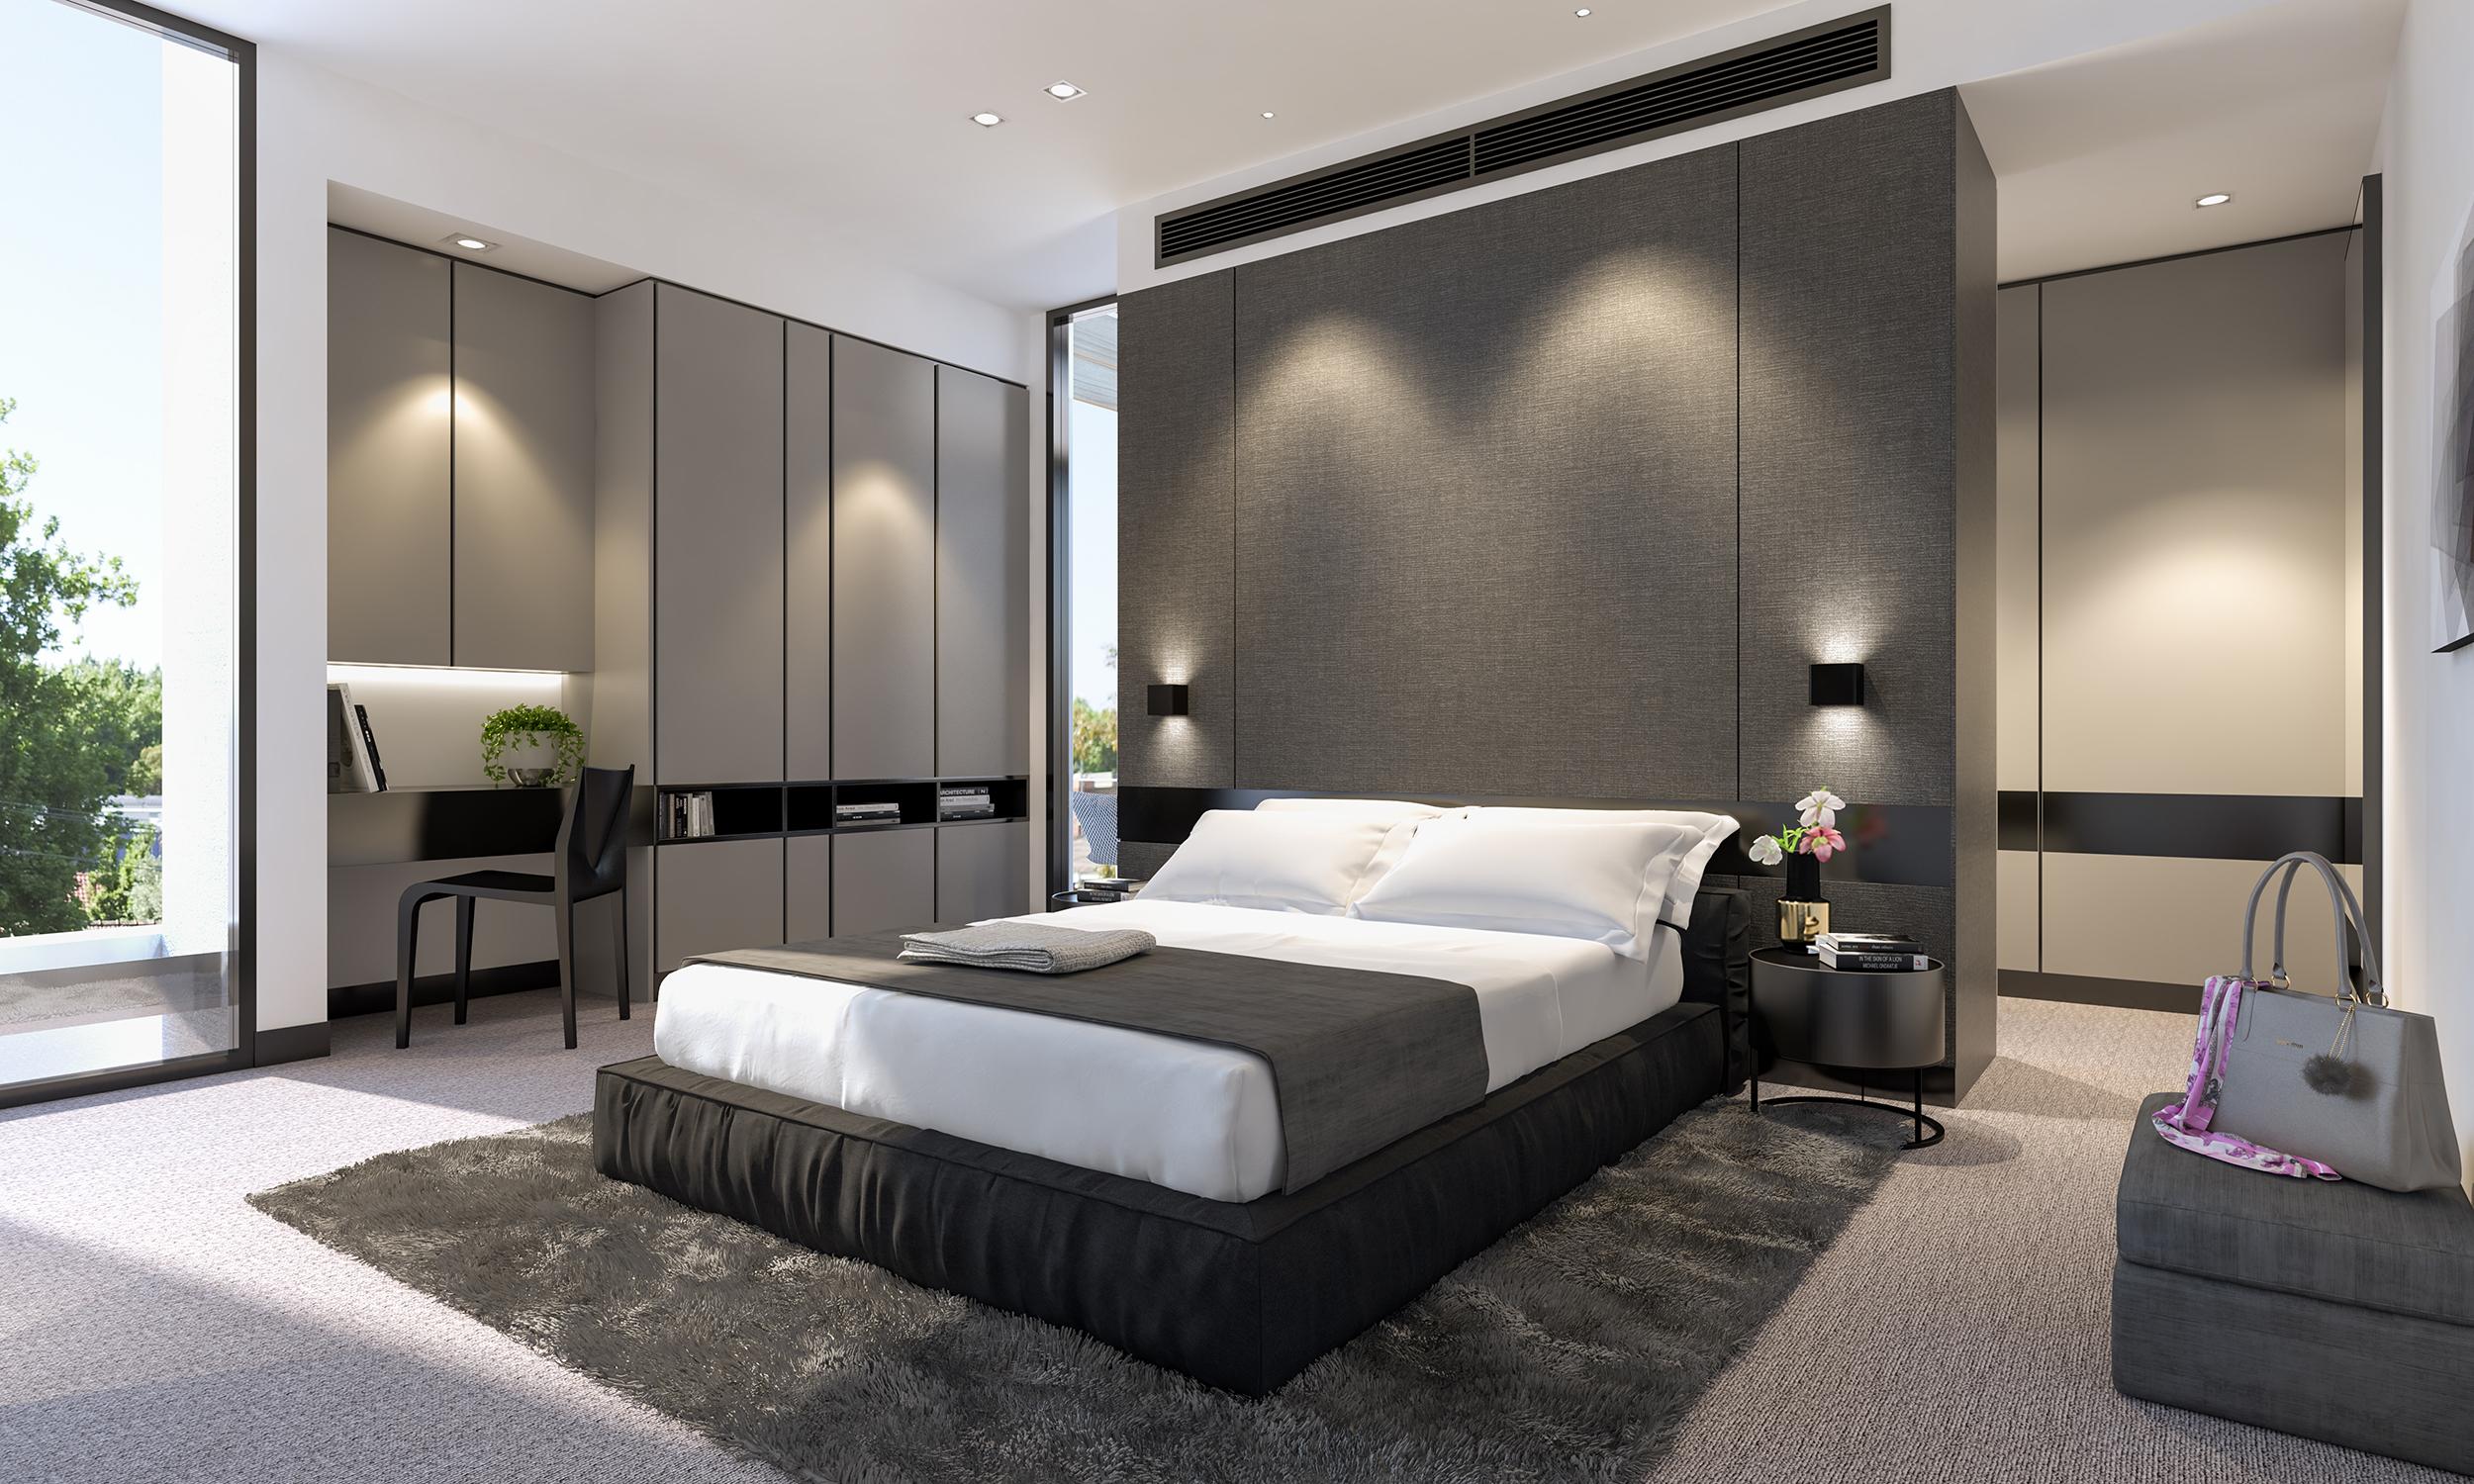 Goldsmith Street - Apartment 1 Bedroom MR.jpg